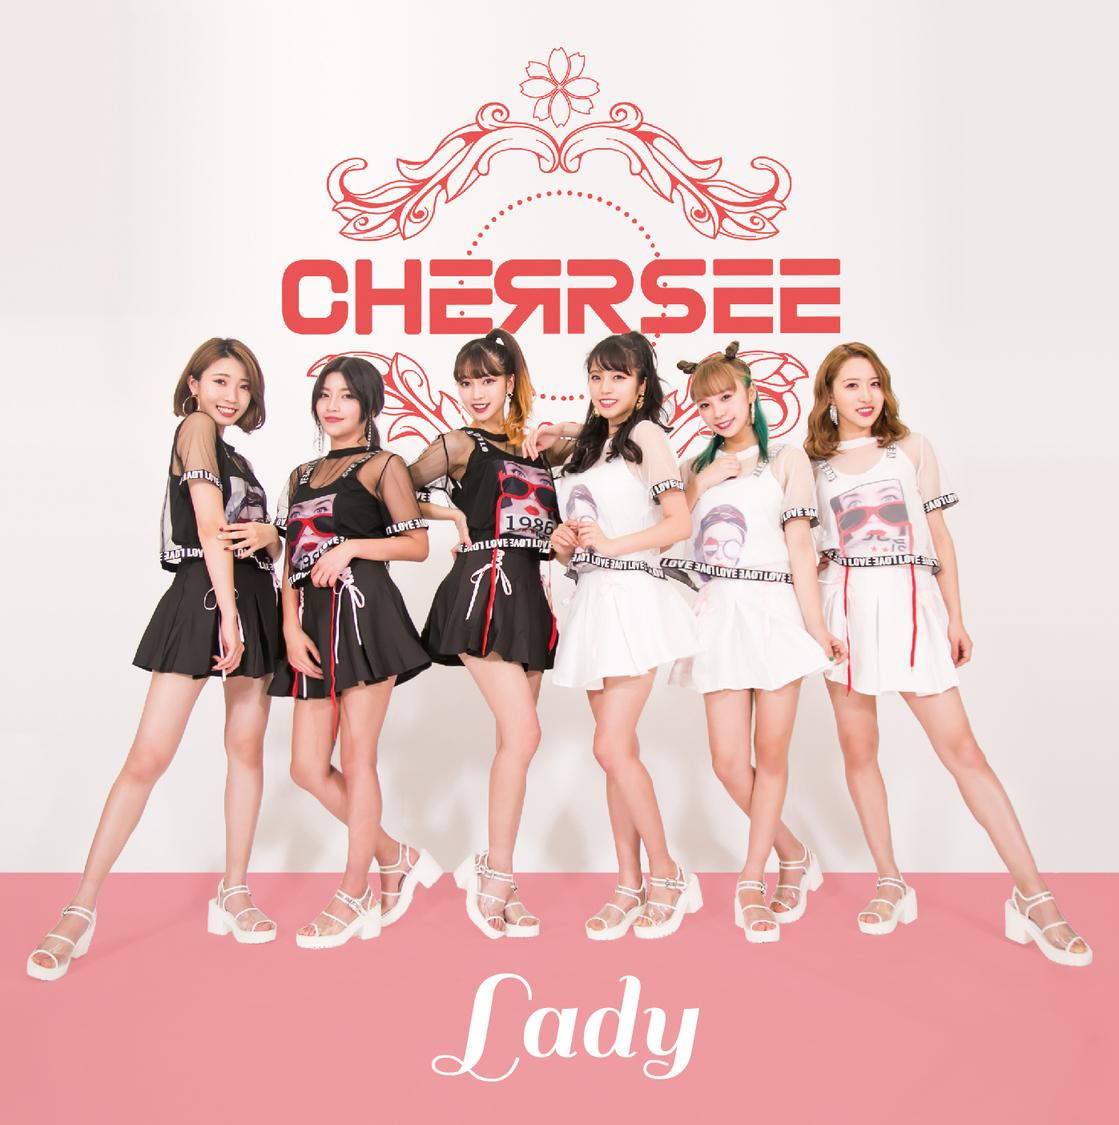 CHERRSEE、4hシングルはDuble Kickプロデュースの中毒性溢れるナンバー!